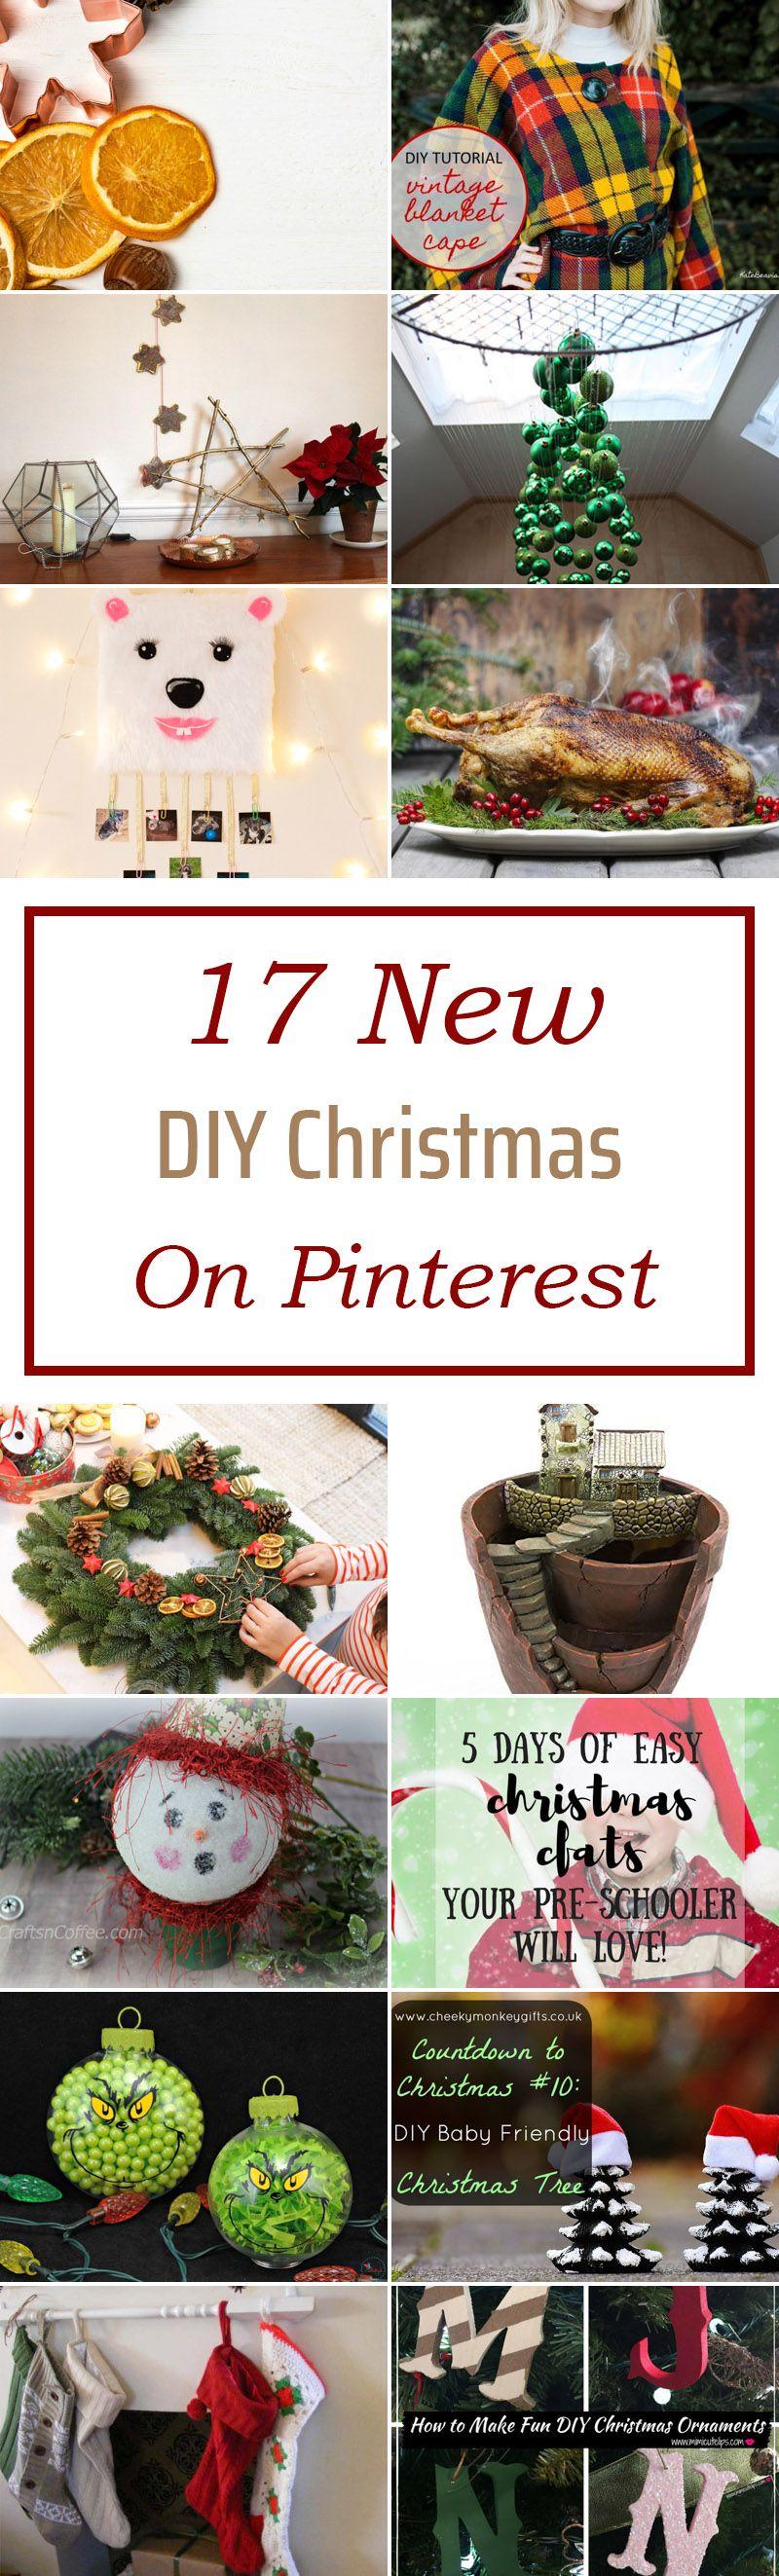 17 New Diy Christmas On Pinterest - Diy Christmas, Diy